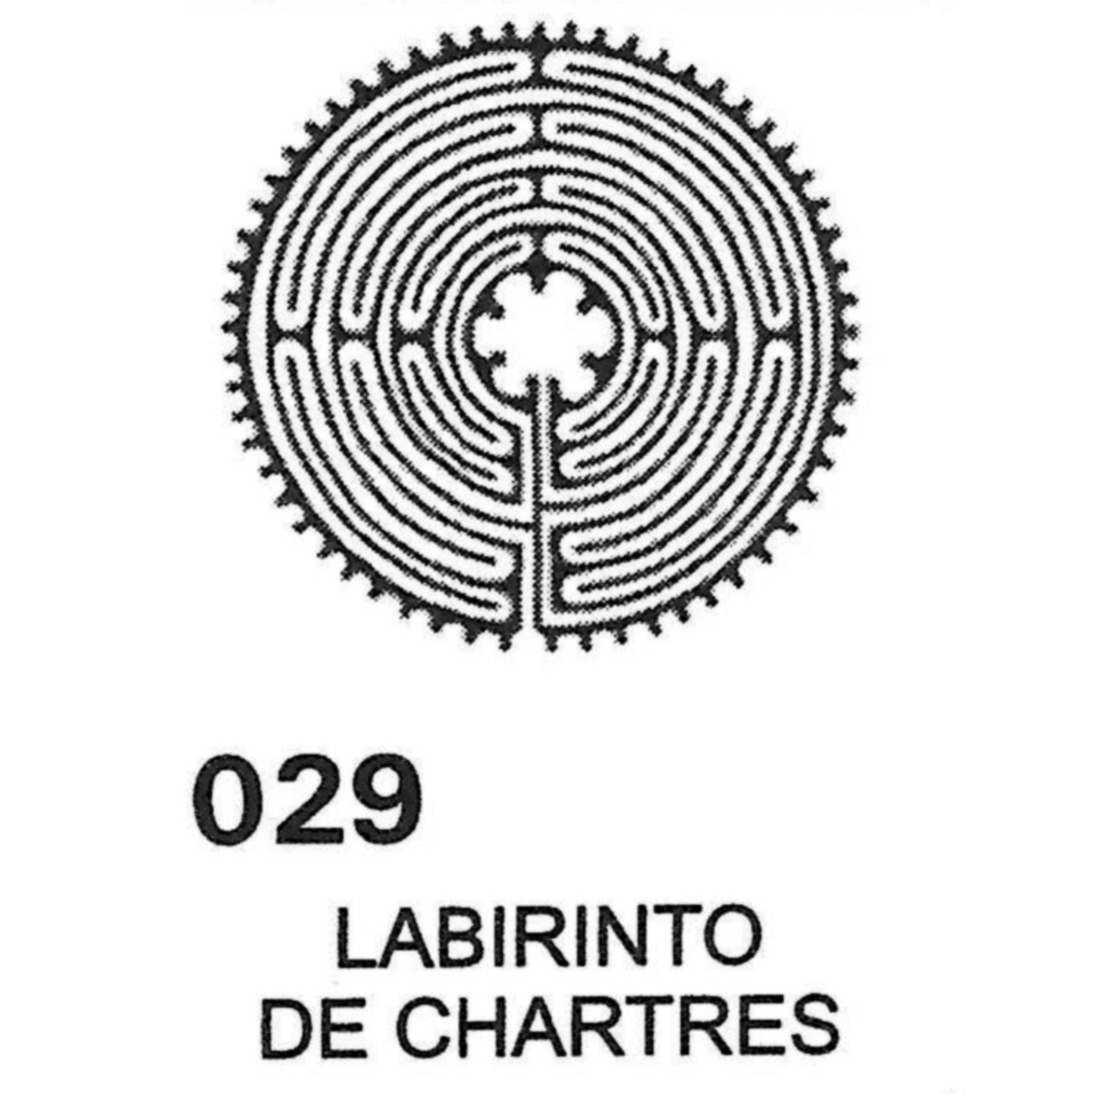 Labirinto Chartres - PVC